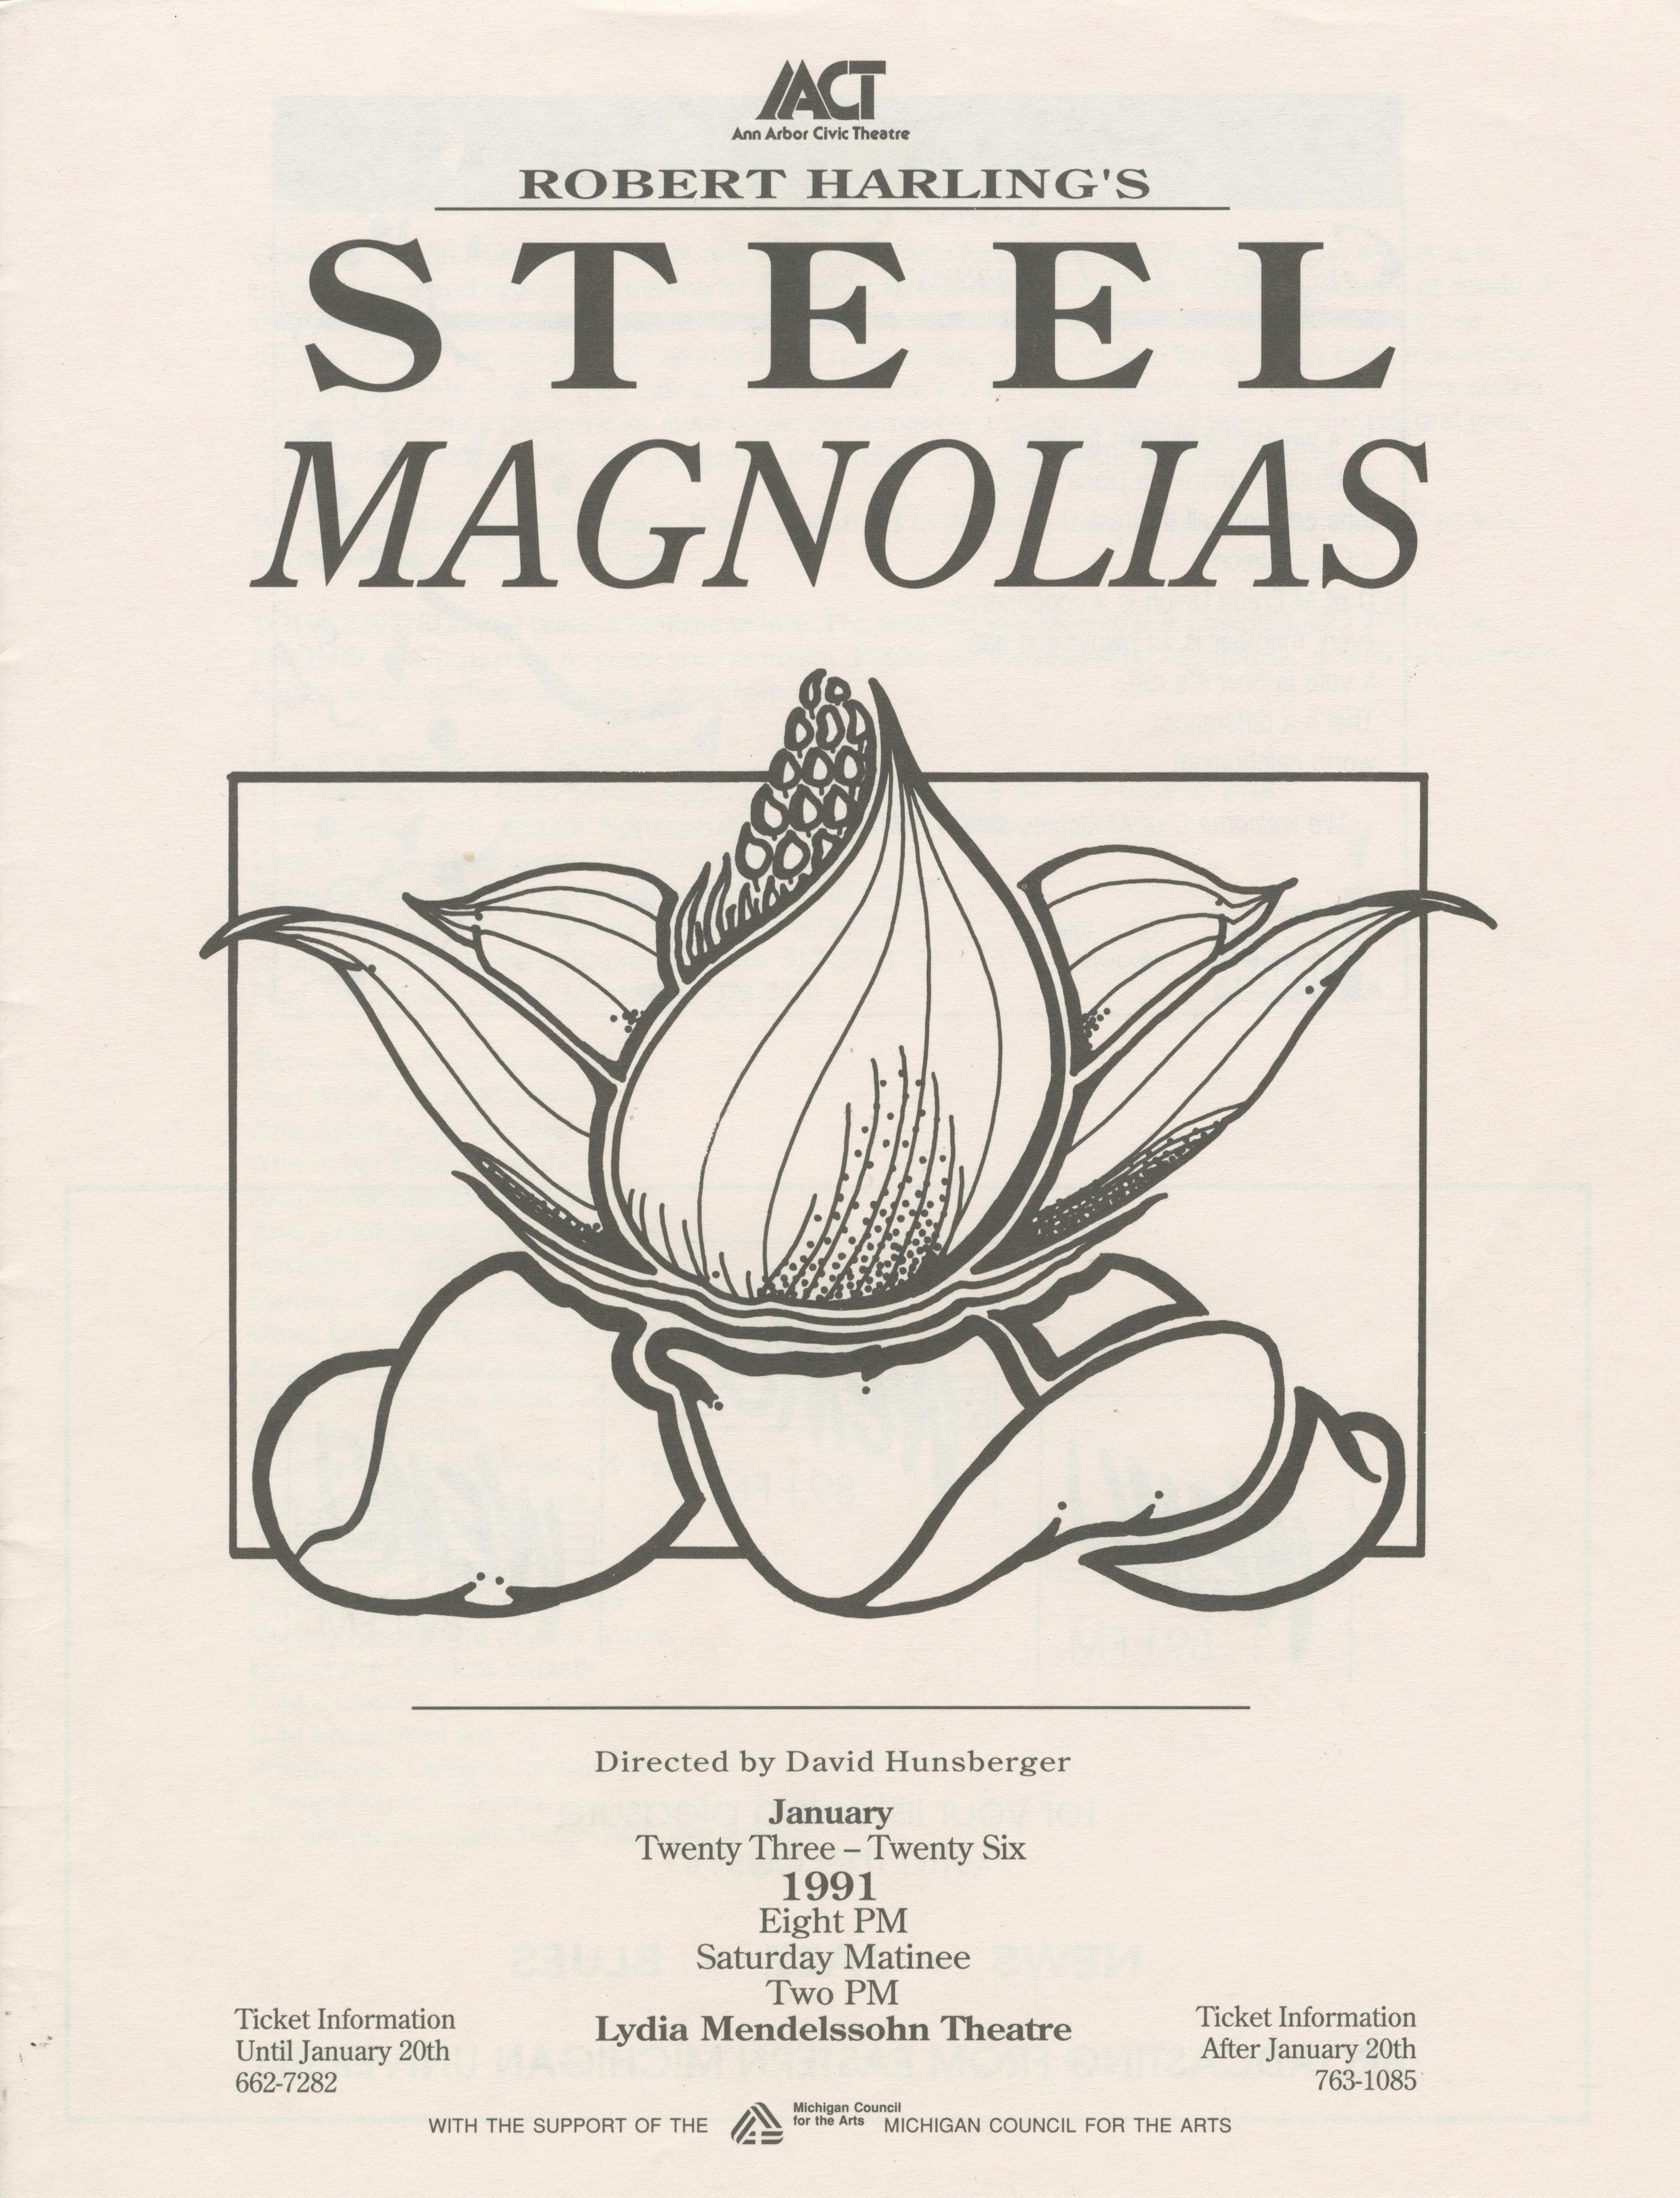 Ann Arbor Civic Theatre Program: Steel Magnolias, January 23, 1991